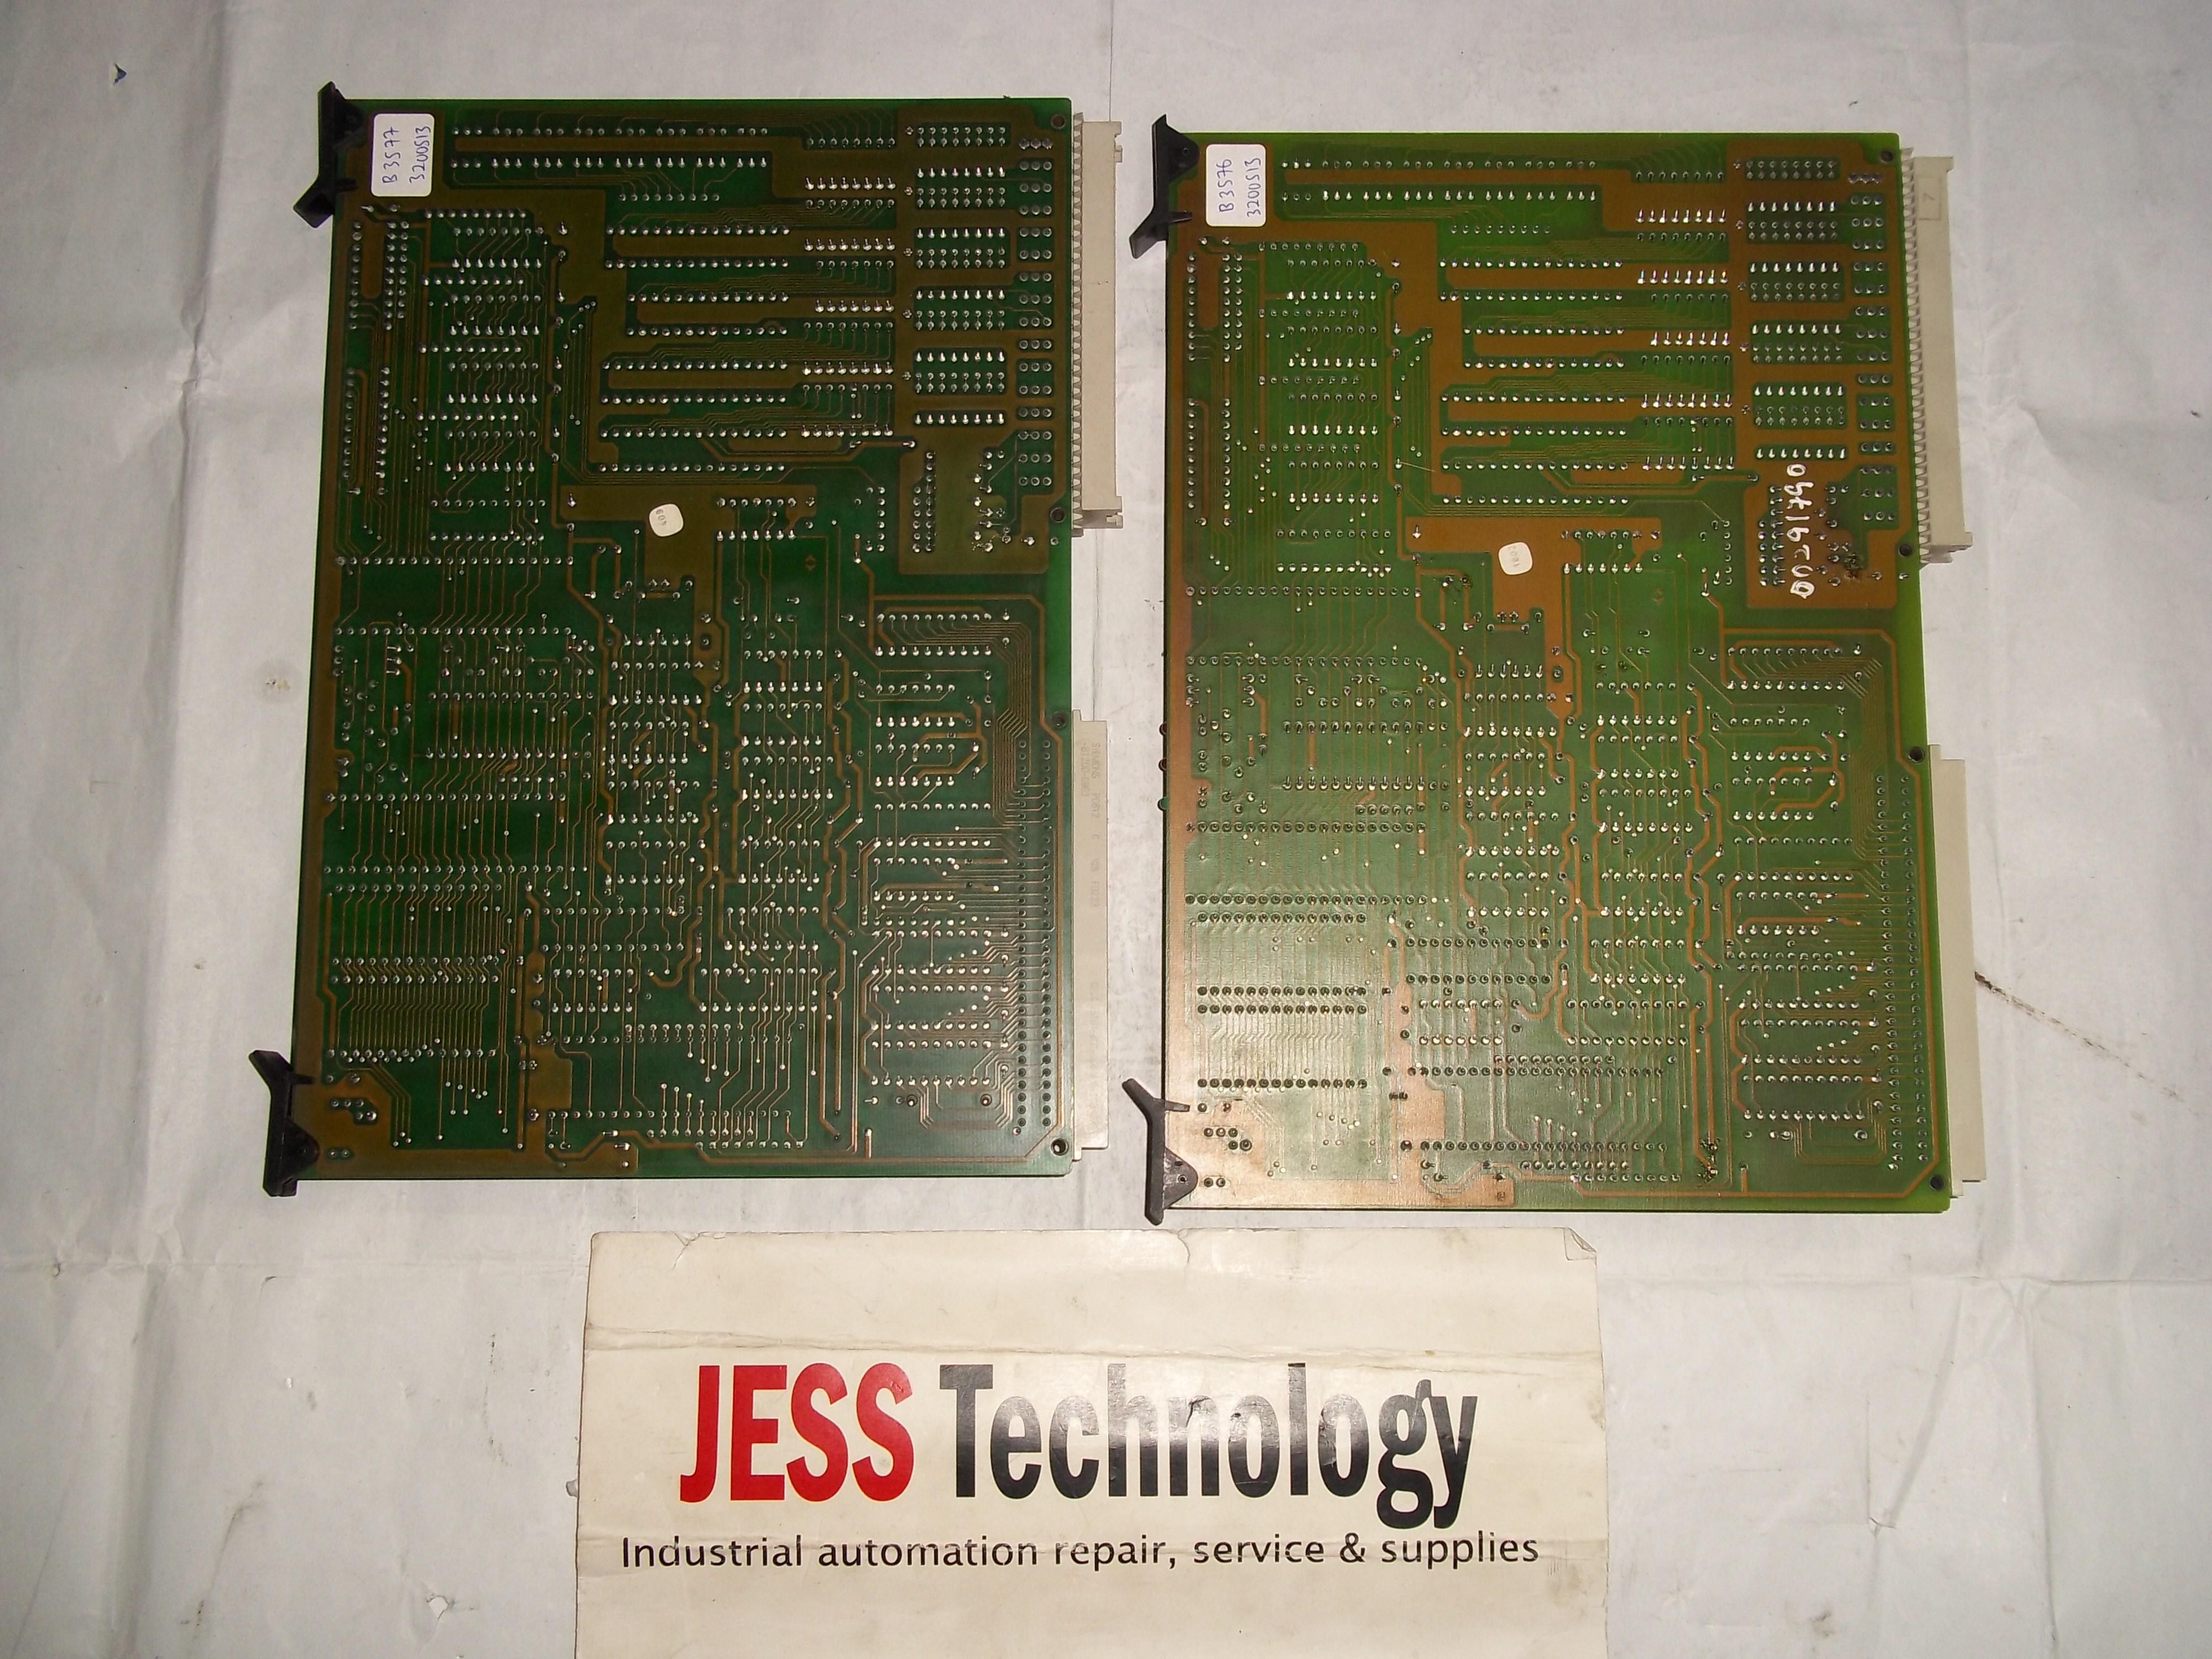 Repair CPUX-1 E93607 PICANOL PICANOL PCB BOARD (CPUX-1 BE93607) in Malaysia, Singapore, Thailand, Indonesia